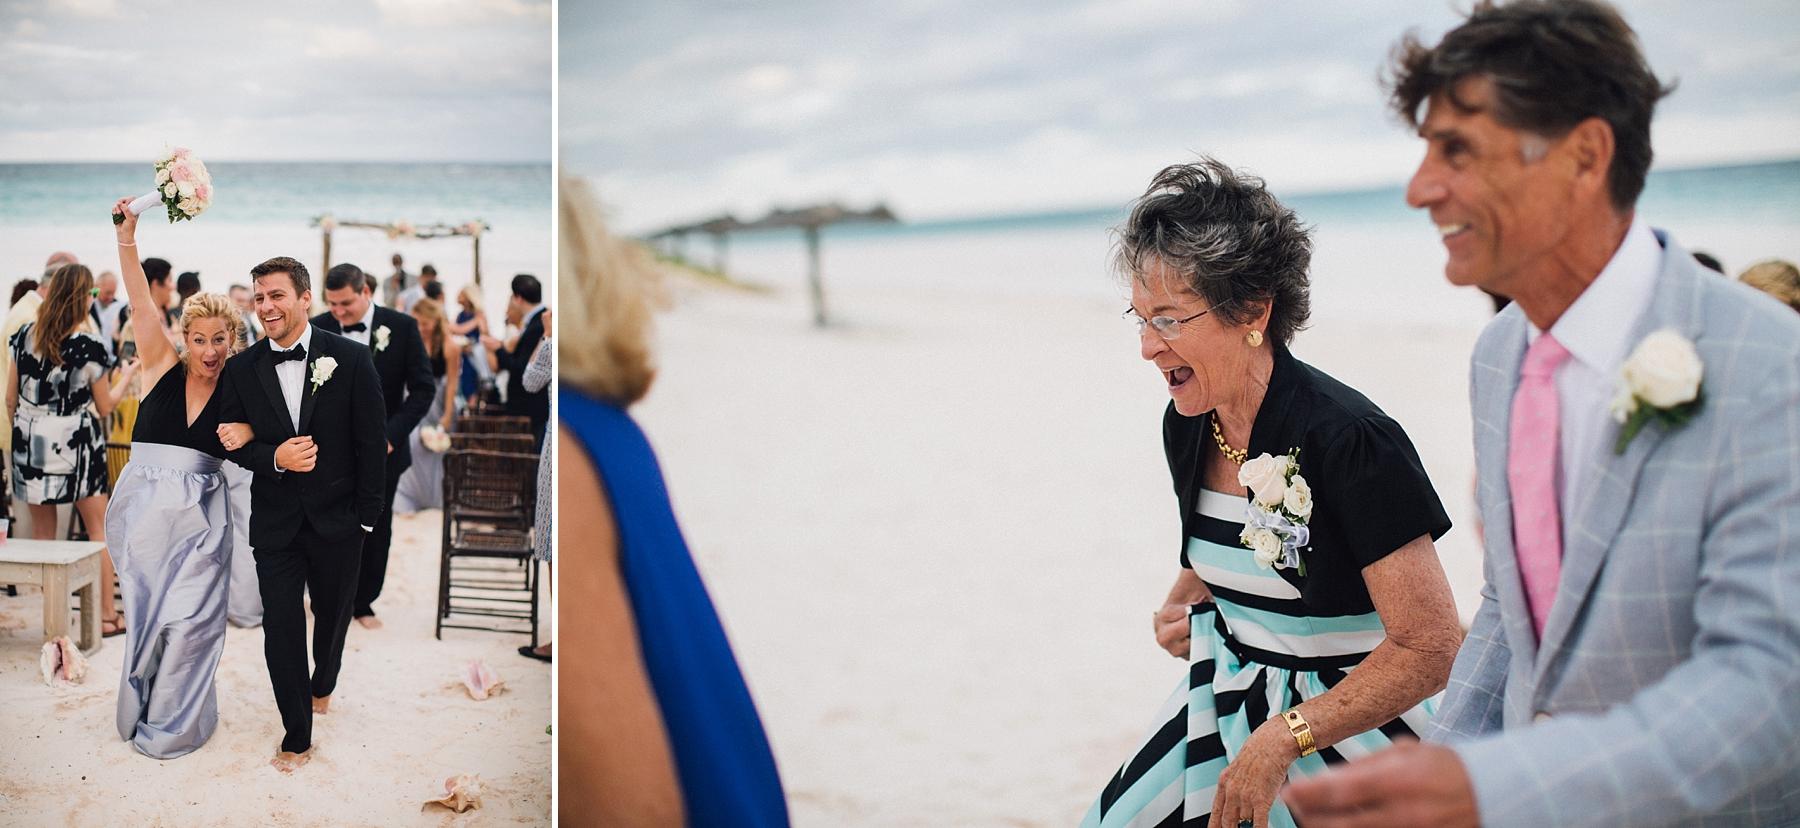 intimate-destination-wedding-beach-moments-harbour-island_0054.jpg